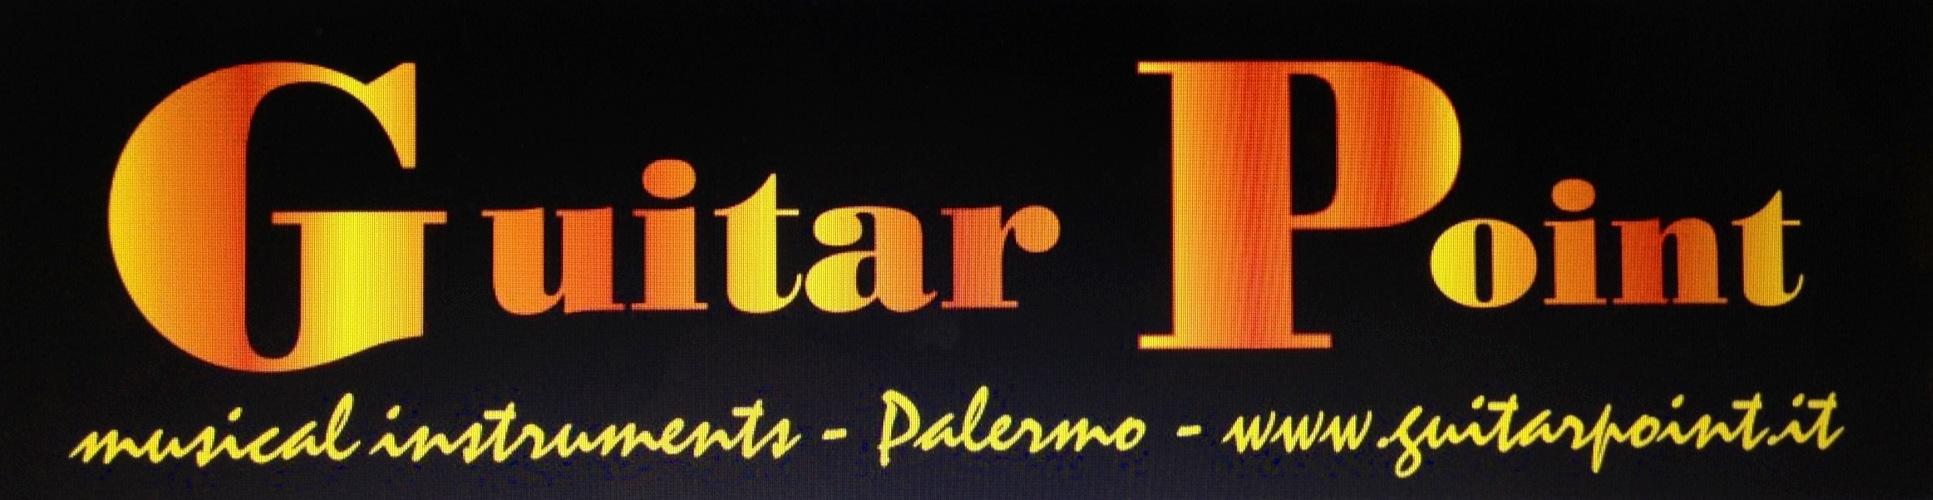 GuitarPoint | Store Online di Accessori e Strumenti Musicali